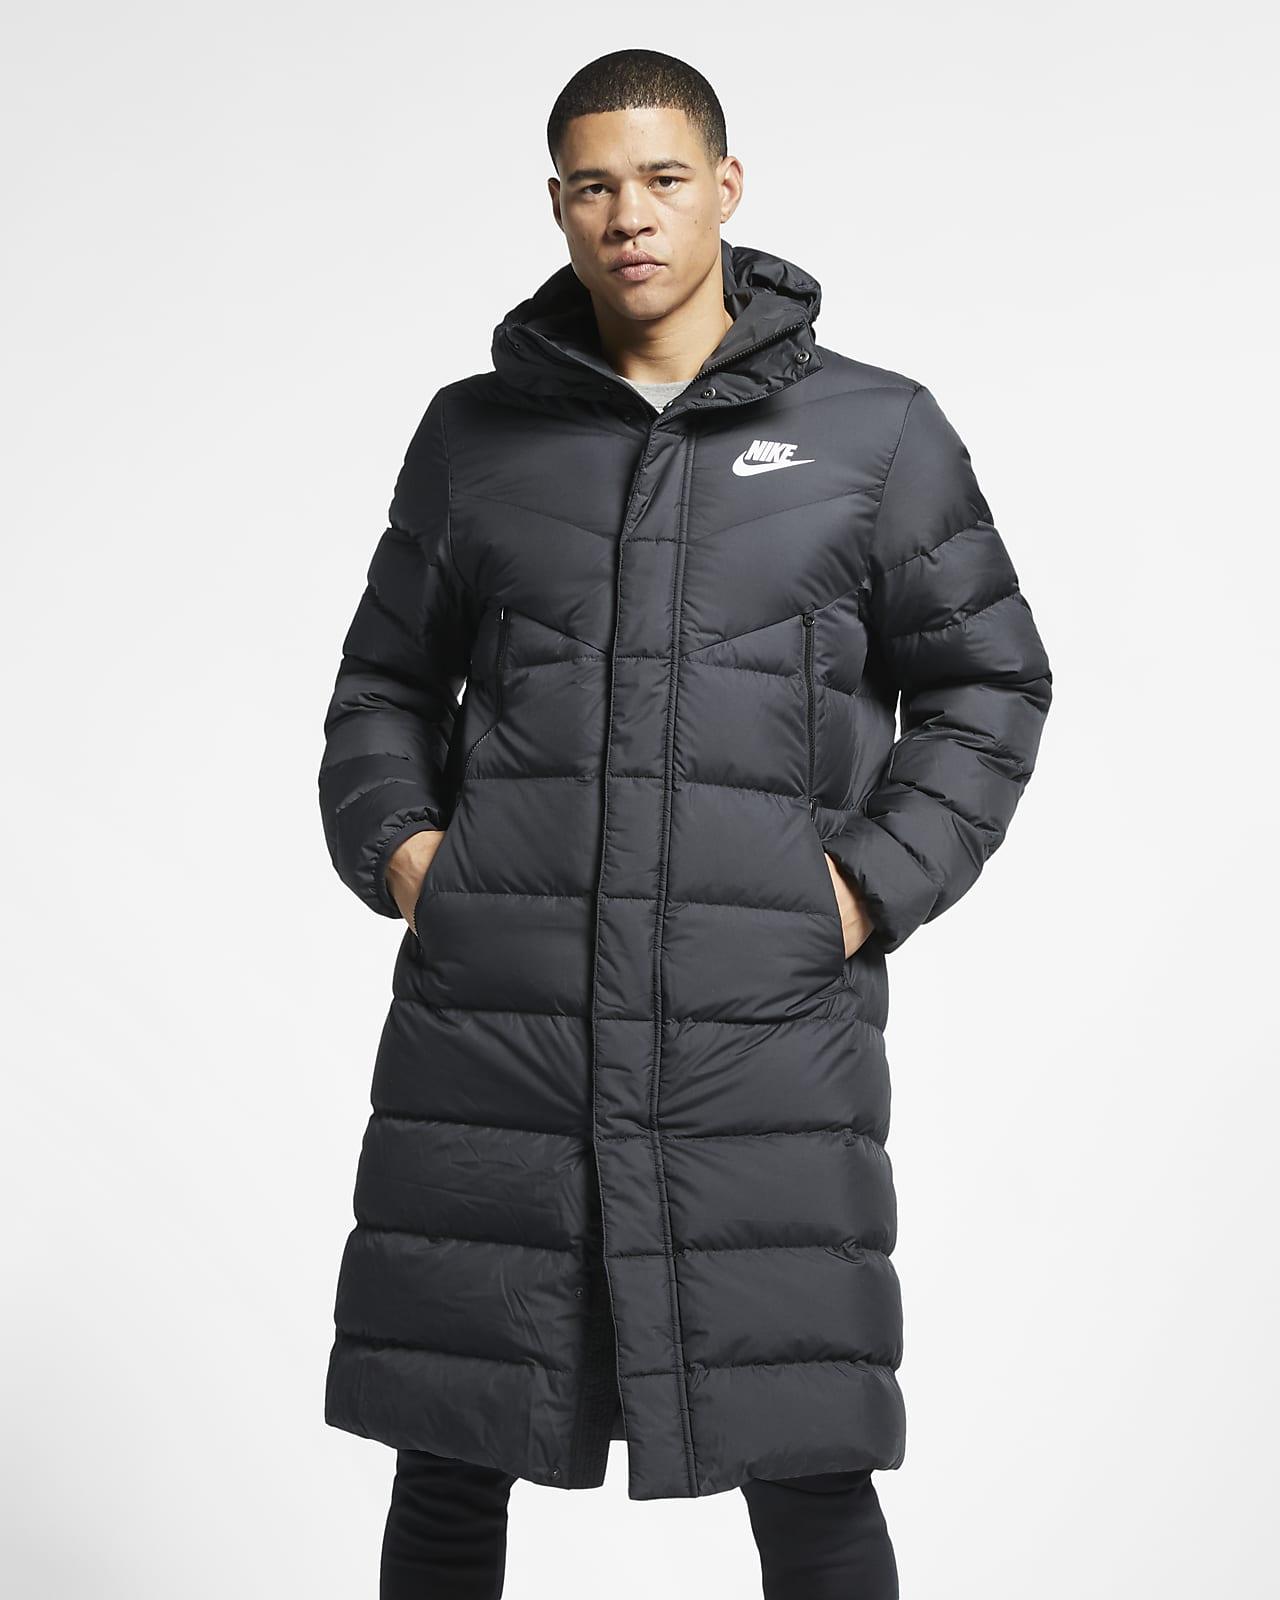 Мужская парка-пуховик с капюшоном Nike Sportswear Windrunner Down Fill